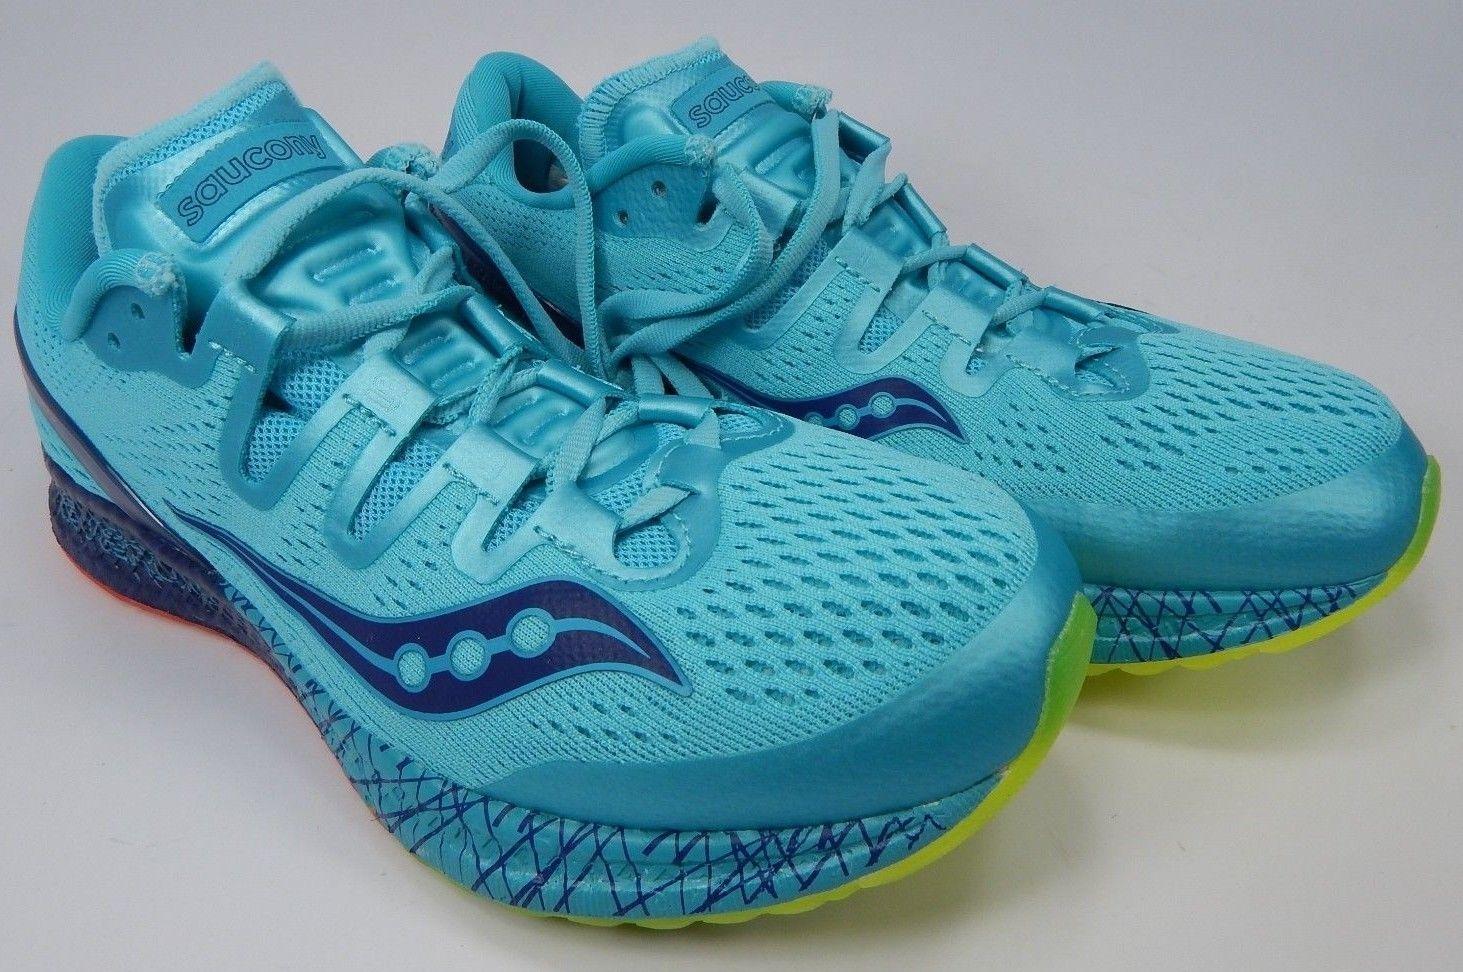 Saucony Freedom ISO Sz US 7.5 M (B) EU 38.5 Women's Running Shoes Blue S10355-3